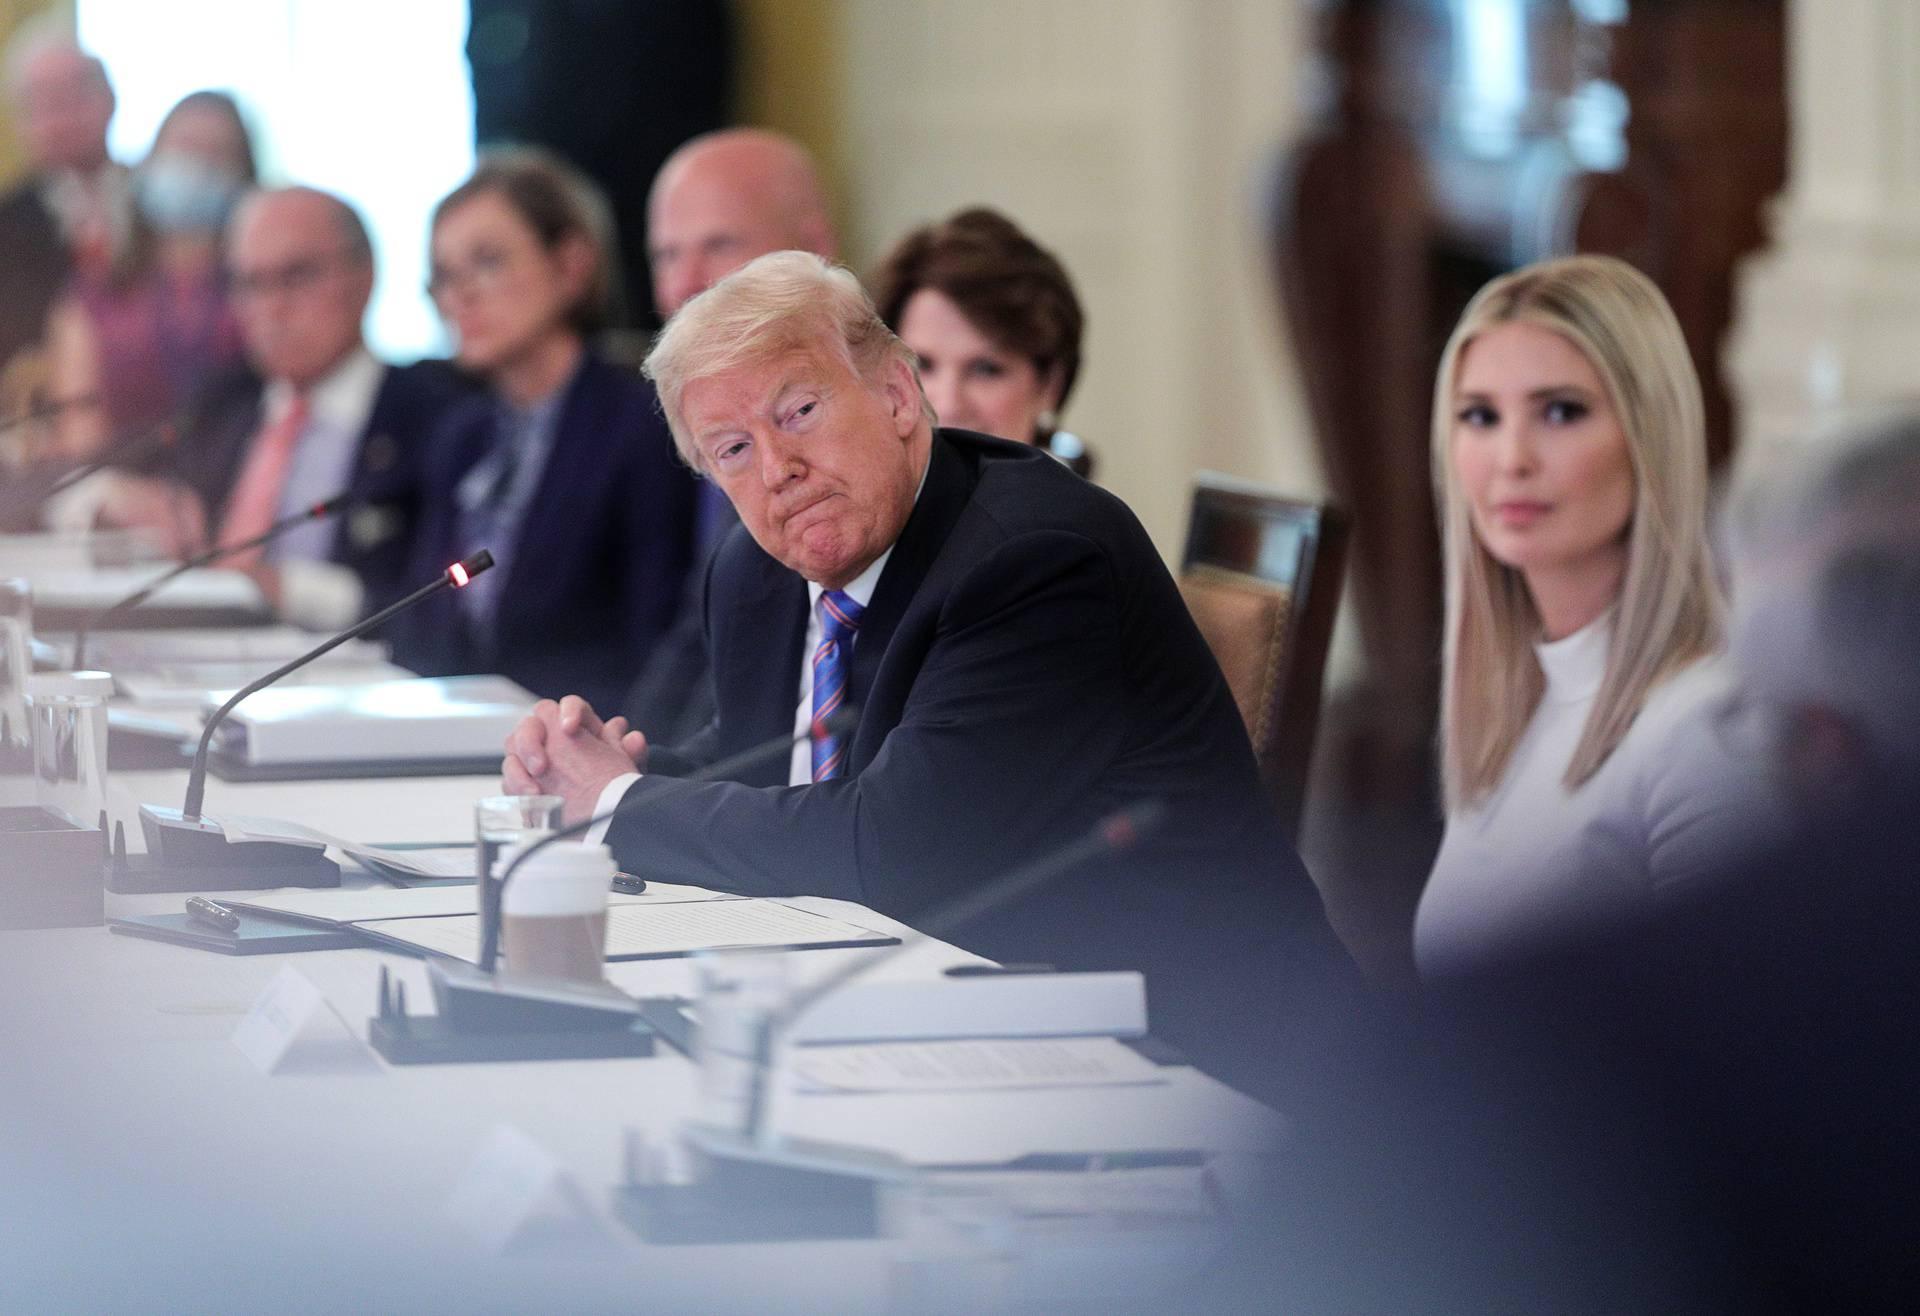 U.S. President Trump hosts workforce advisory board meeting at the White House in Washington